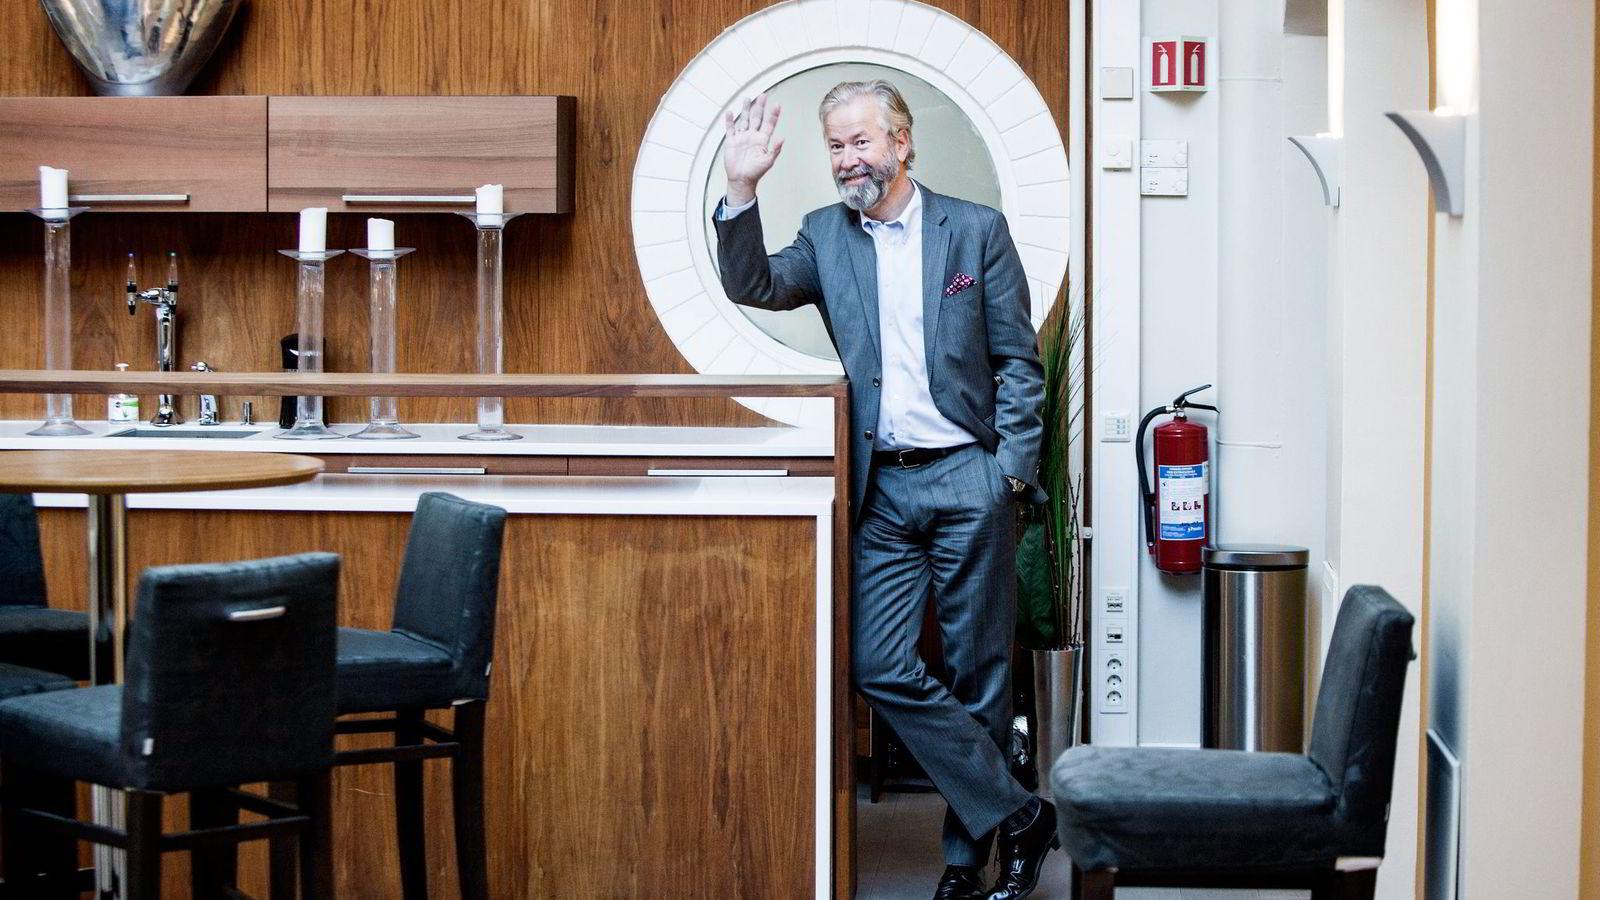 Ole Jacob Sunde er styreleder i Schibsted og Stiftelsen Tinius. Han er også en ekspert på forvaltning av formuer, og styreleder i selskapet Formuesforvaltning.